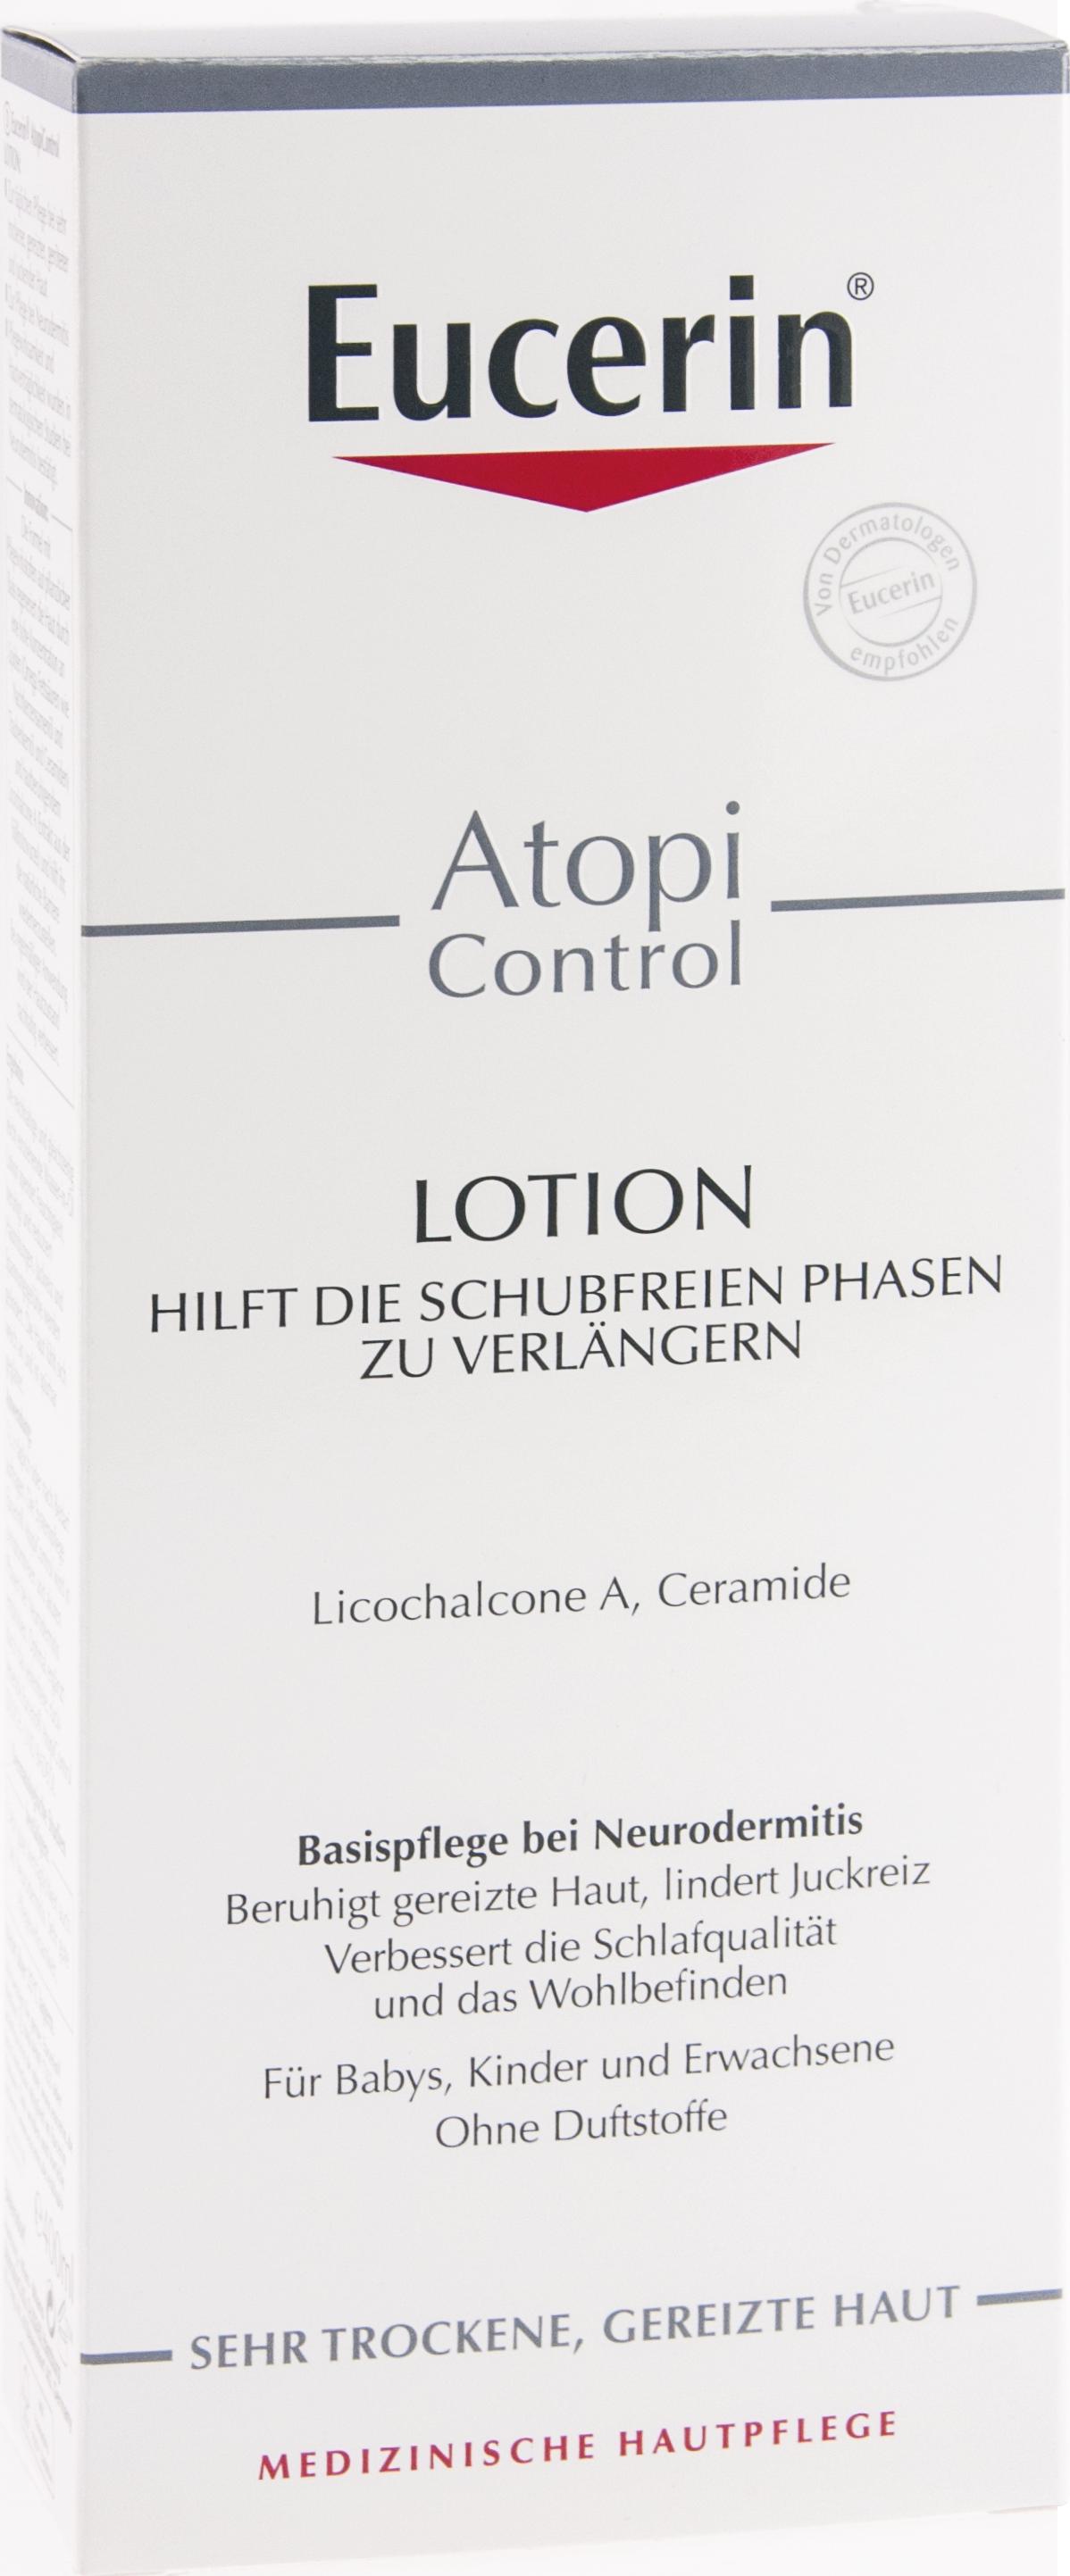 Eucerin AtopiControl Lotion